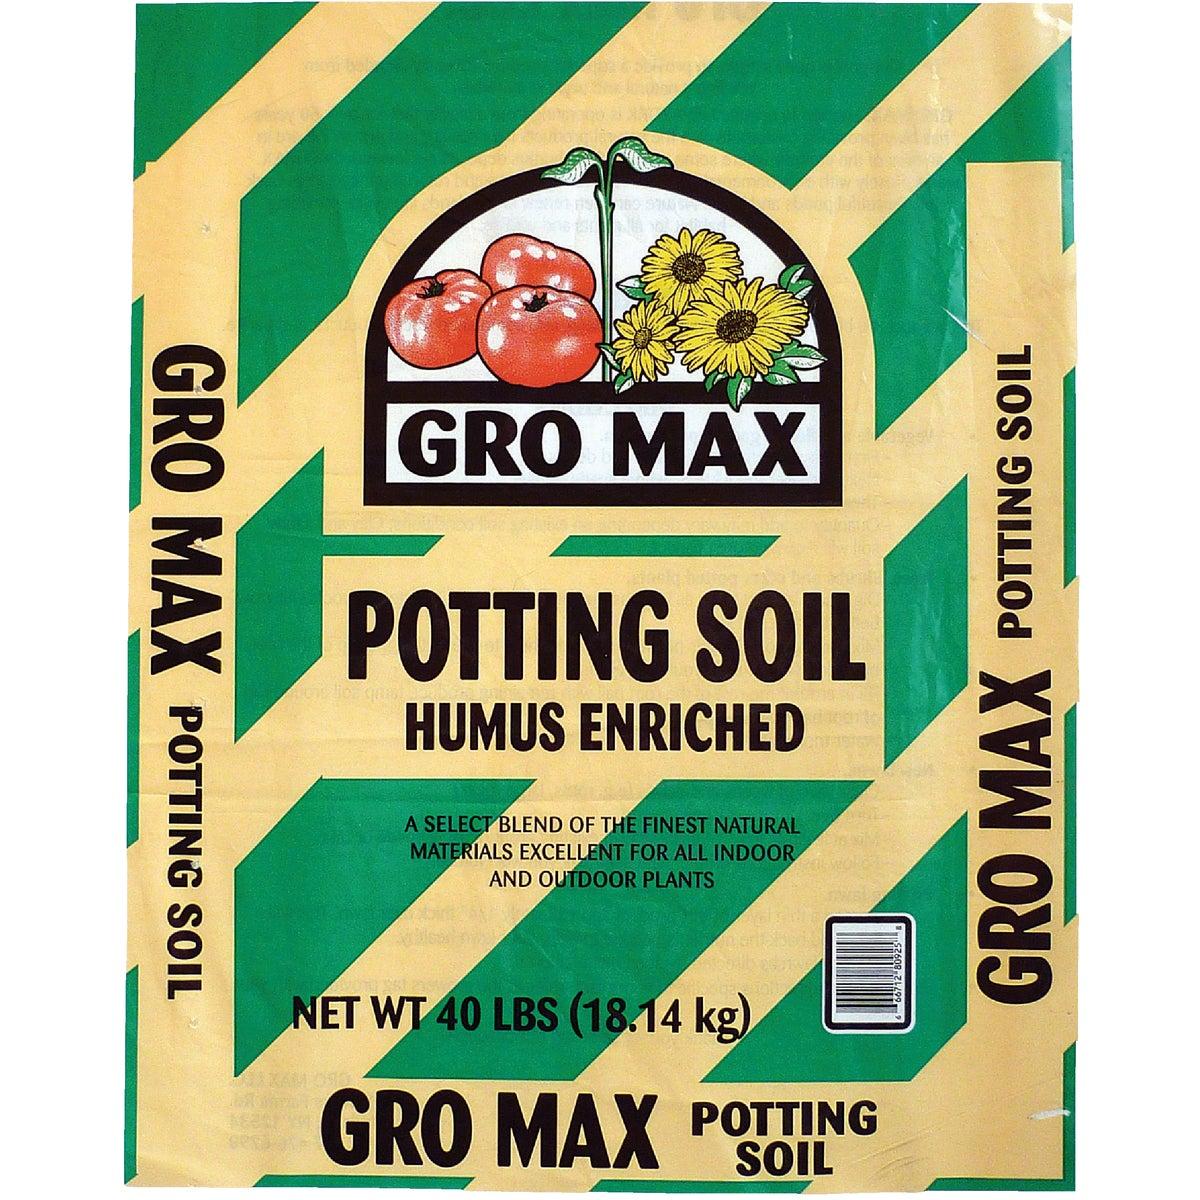 40LB POTTING SOIL - 054050 by Gromax L L C